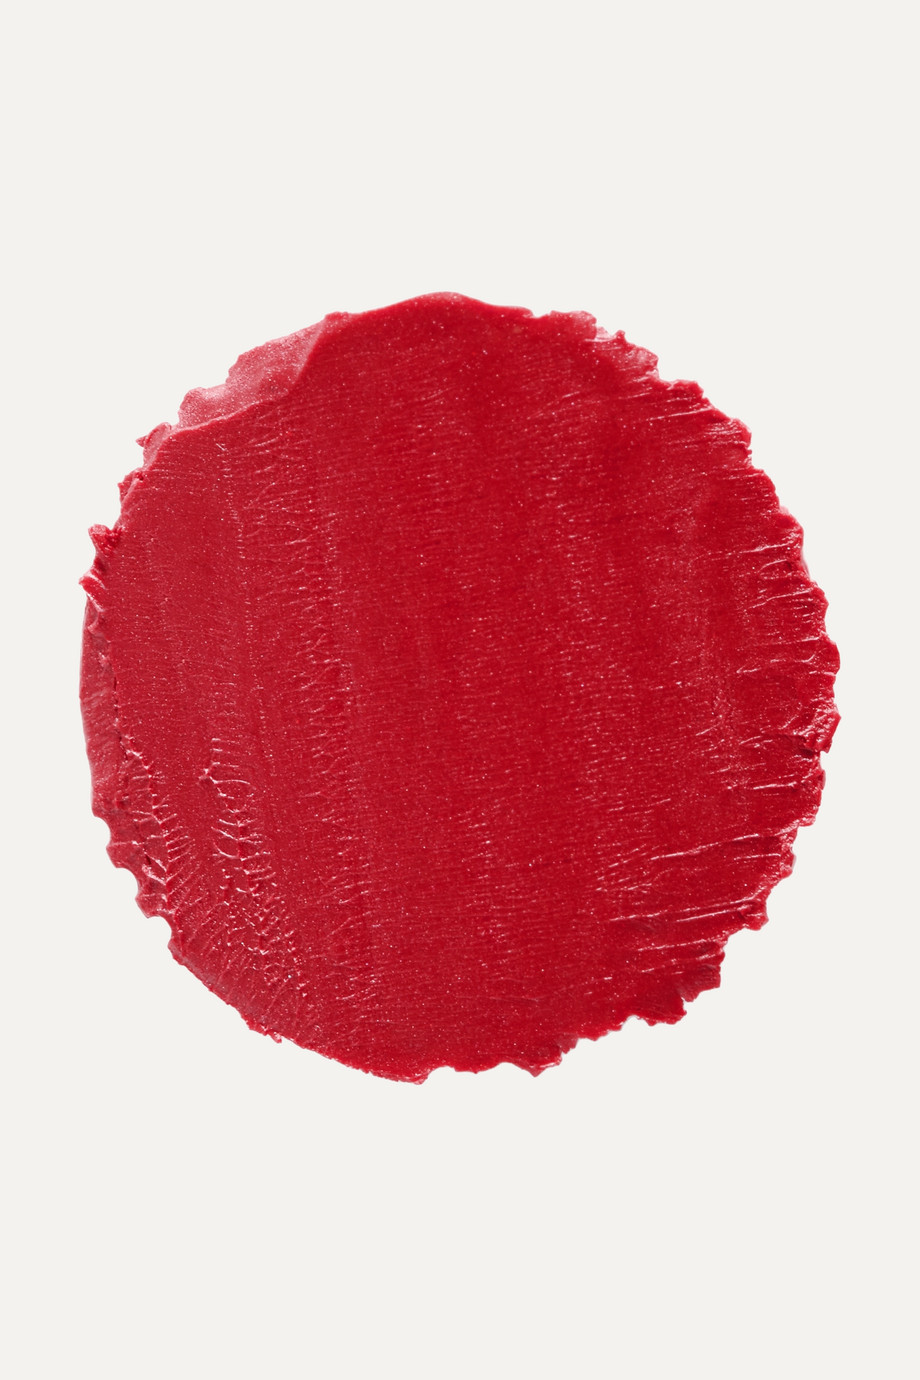 Burberry Beauty Burberry Kisses - Poppy Red No.105